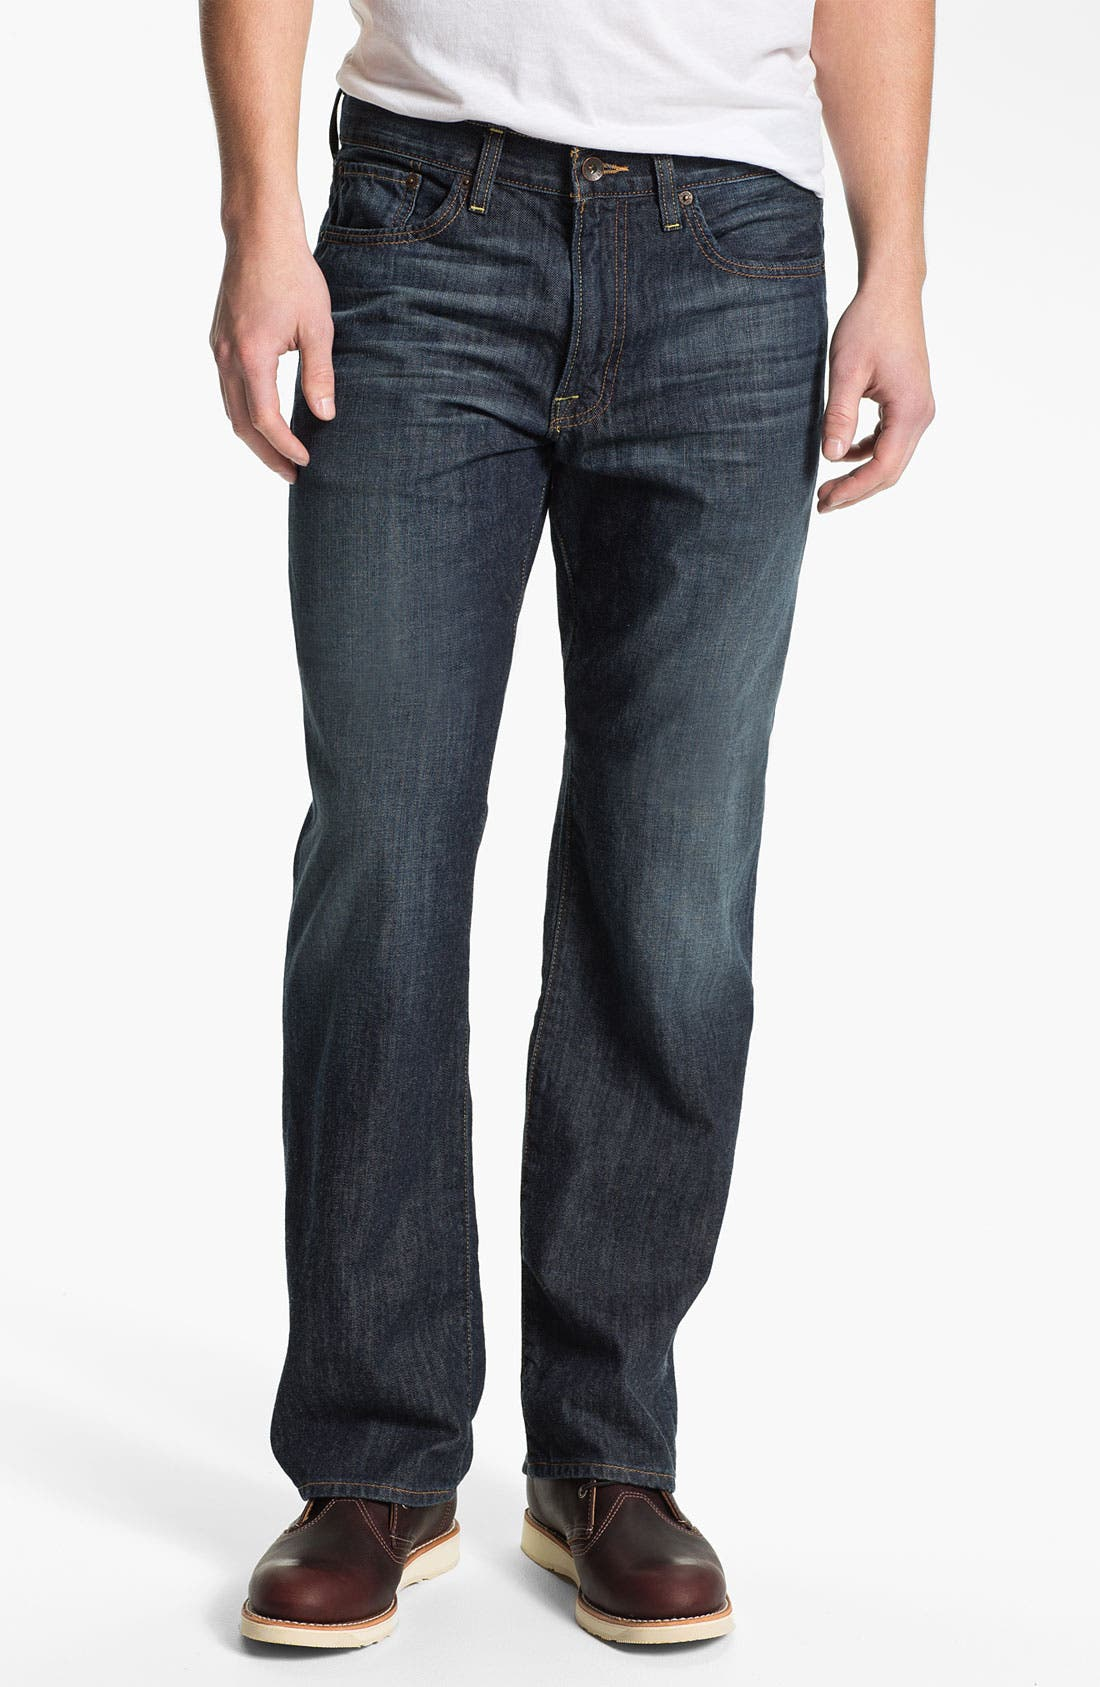 Main Image - Lucky Brand '361 Vintage' Straight Leg Jeans (Dark Bordeaux)